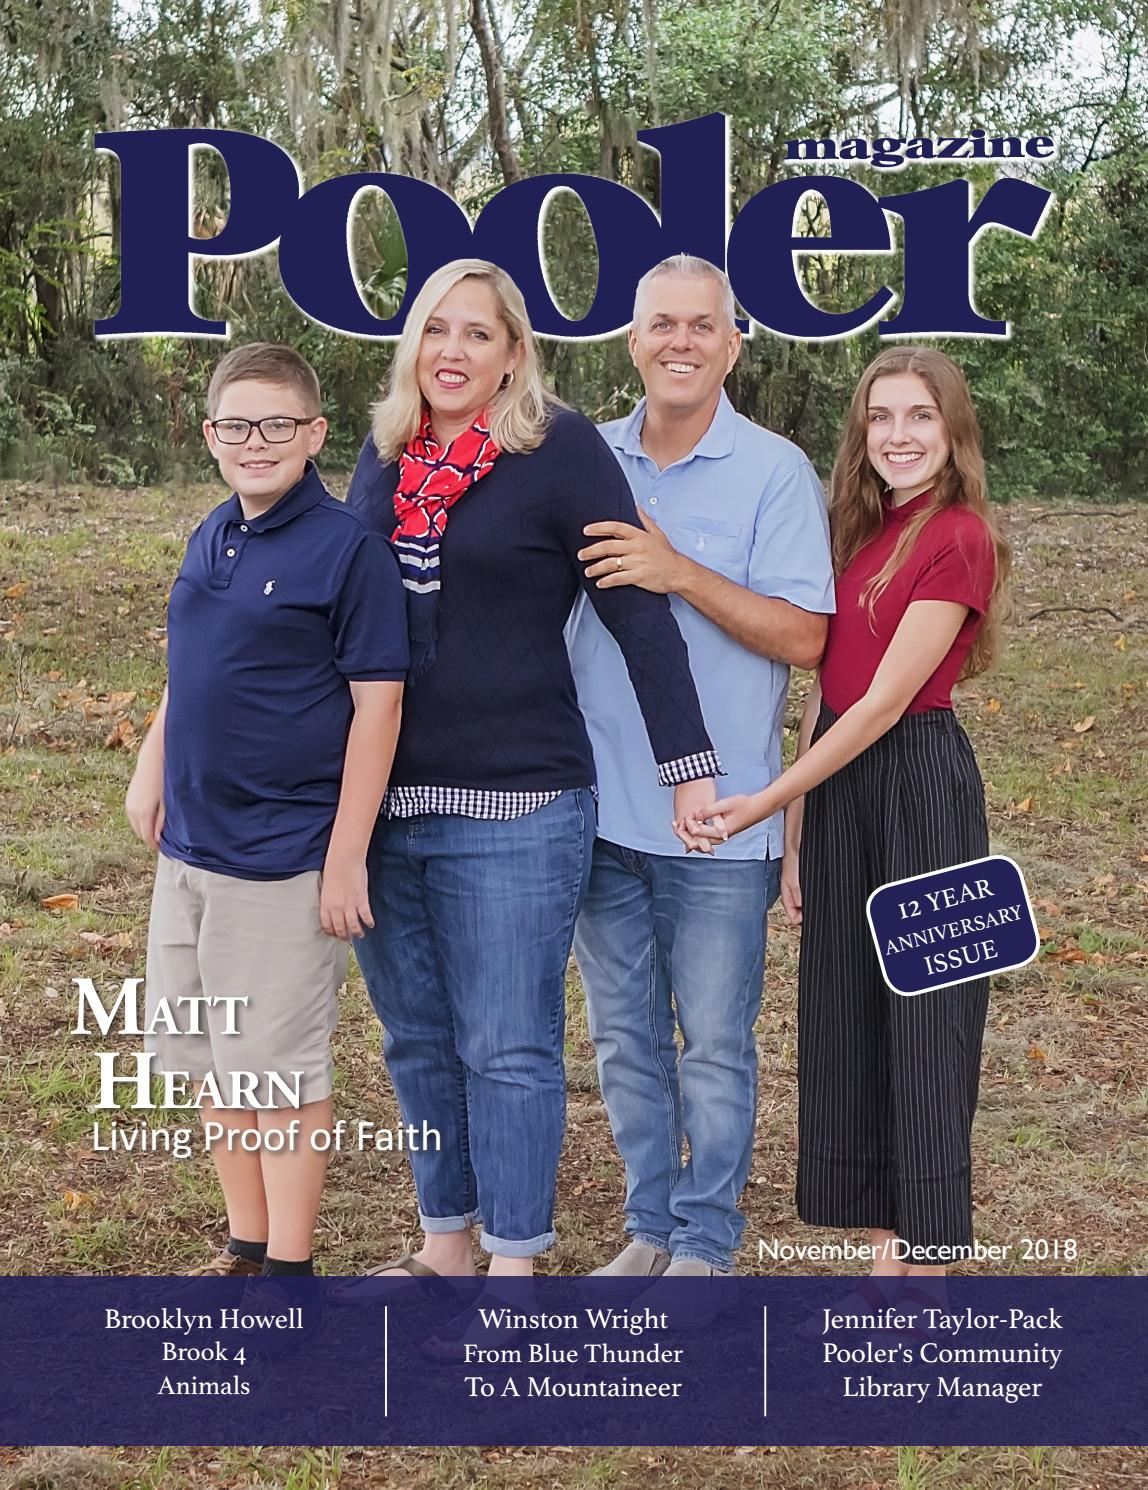 Pooler Magazine - November/December 2018 by Independence Day